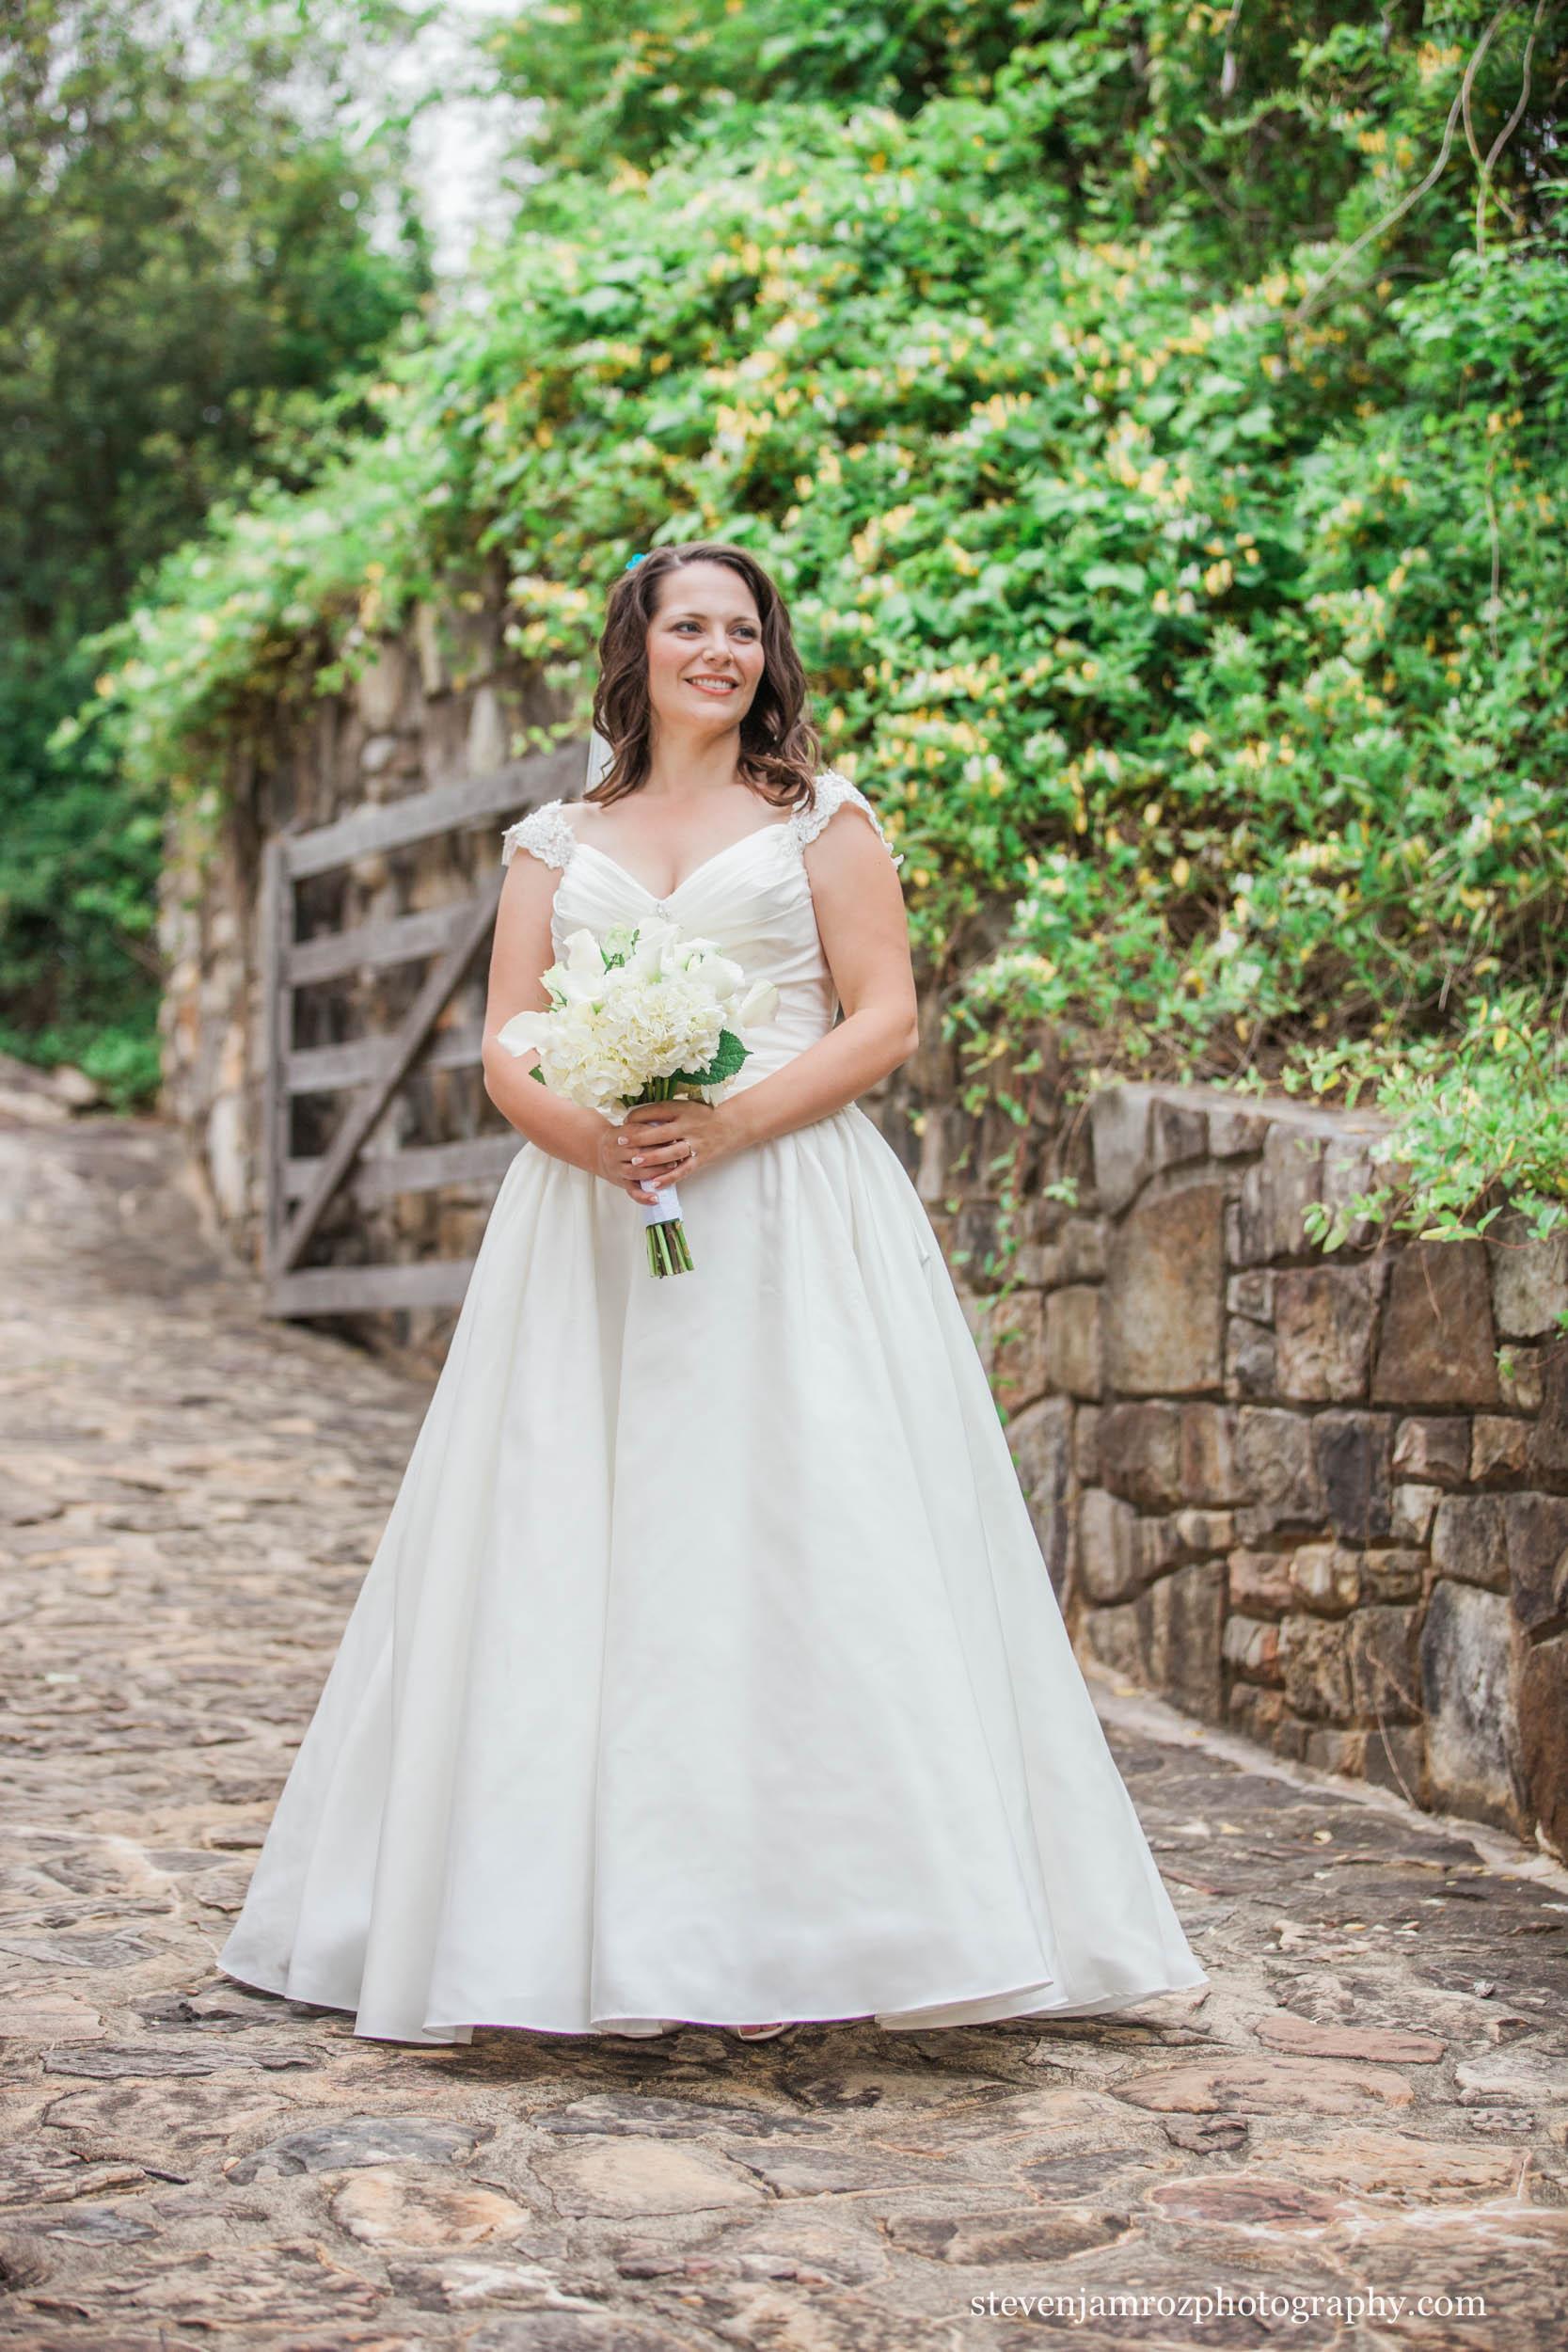 pretty-bride-yates-mill-raleigh-steven-jamroz-photography-0528.jpg